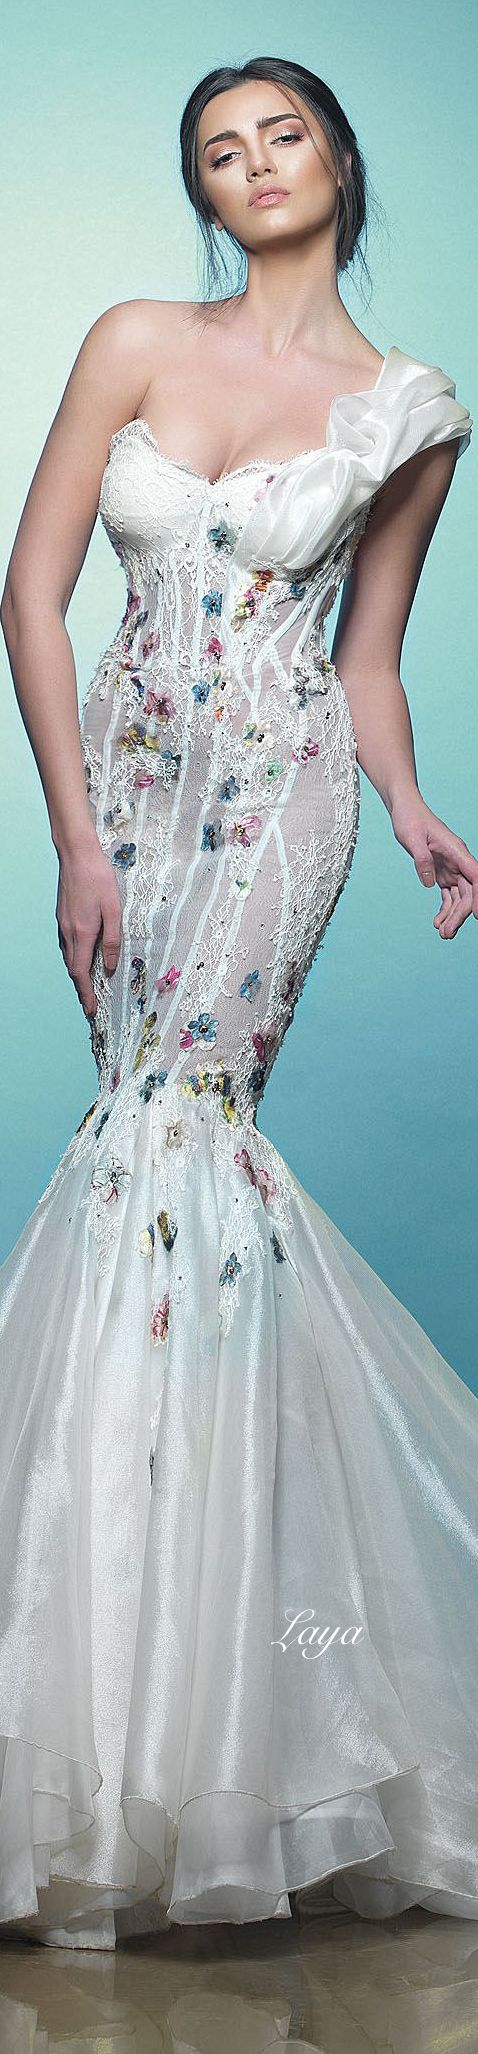 174 best Wedding Gowns: Floral Fantasy images on Pinterest | Brides ...